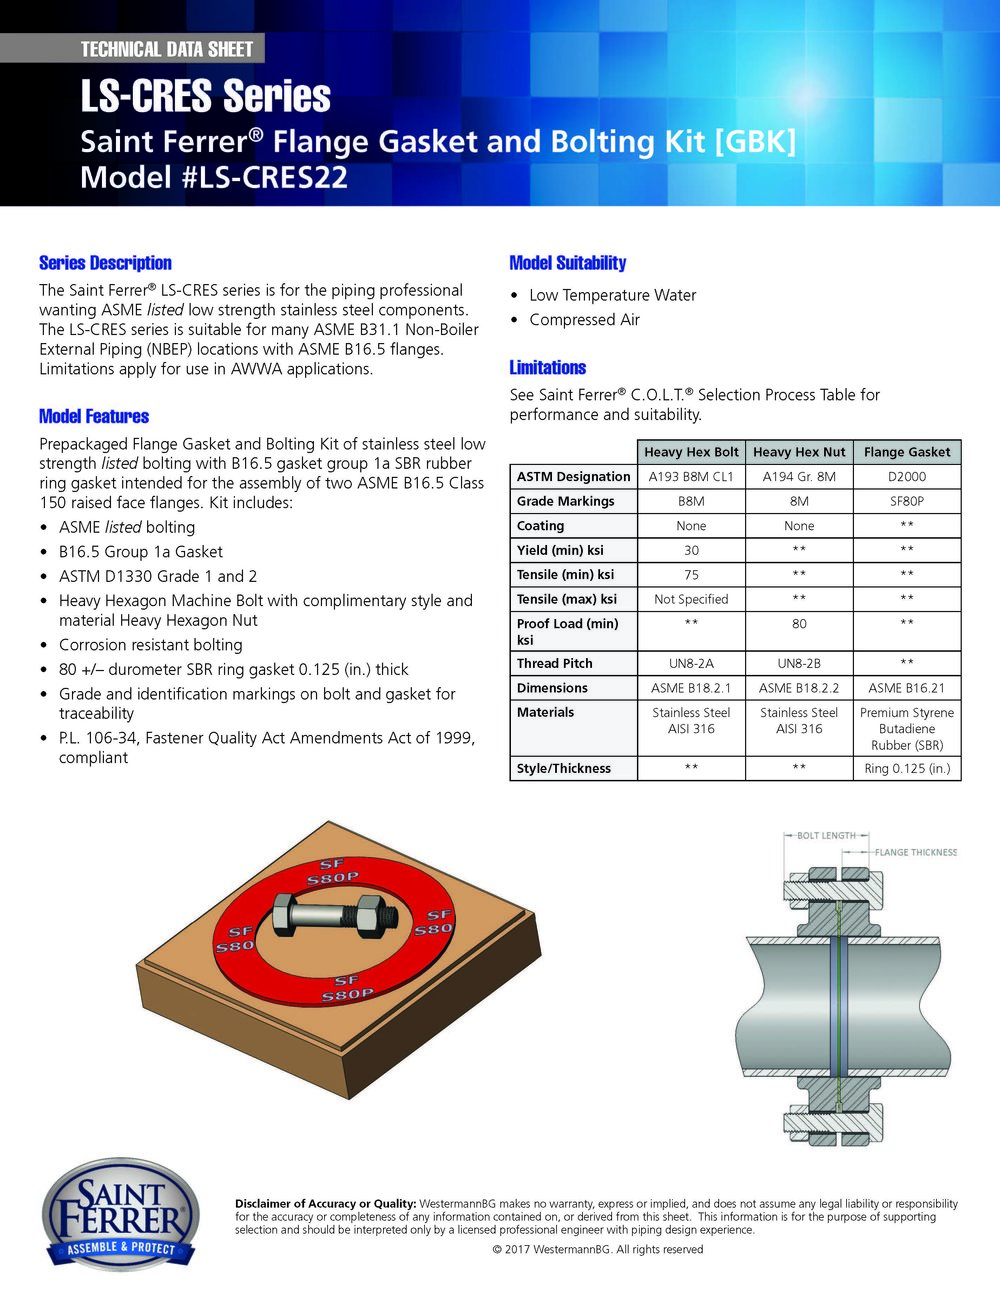 SF_Data_Sheet_LS-CRES_Series_LS-CRES22.jpg